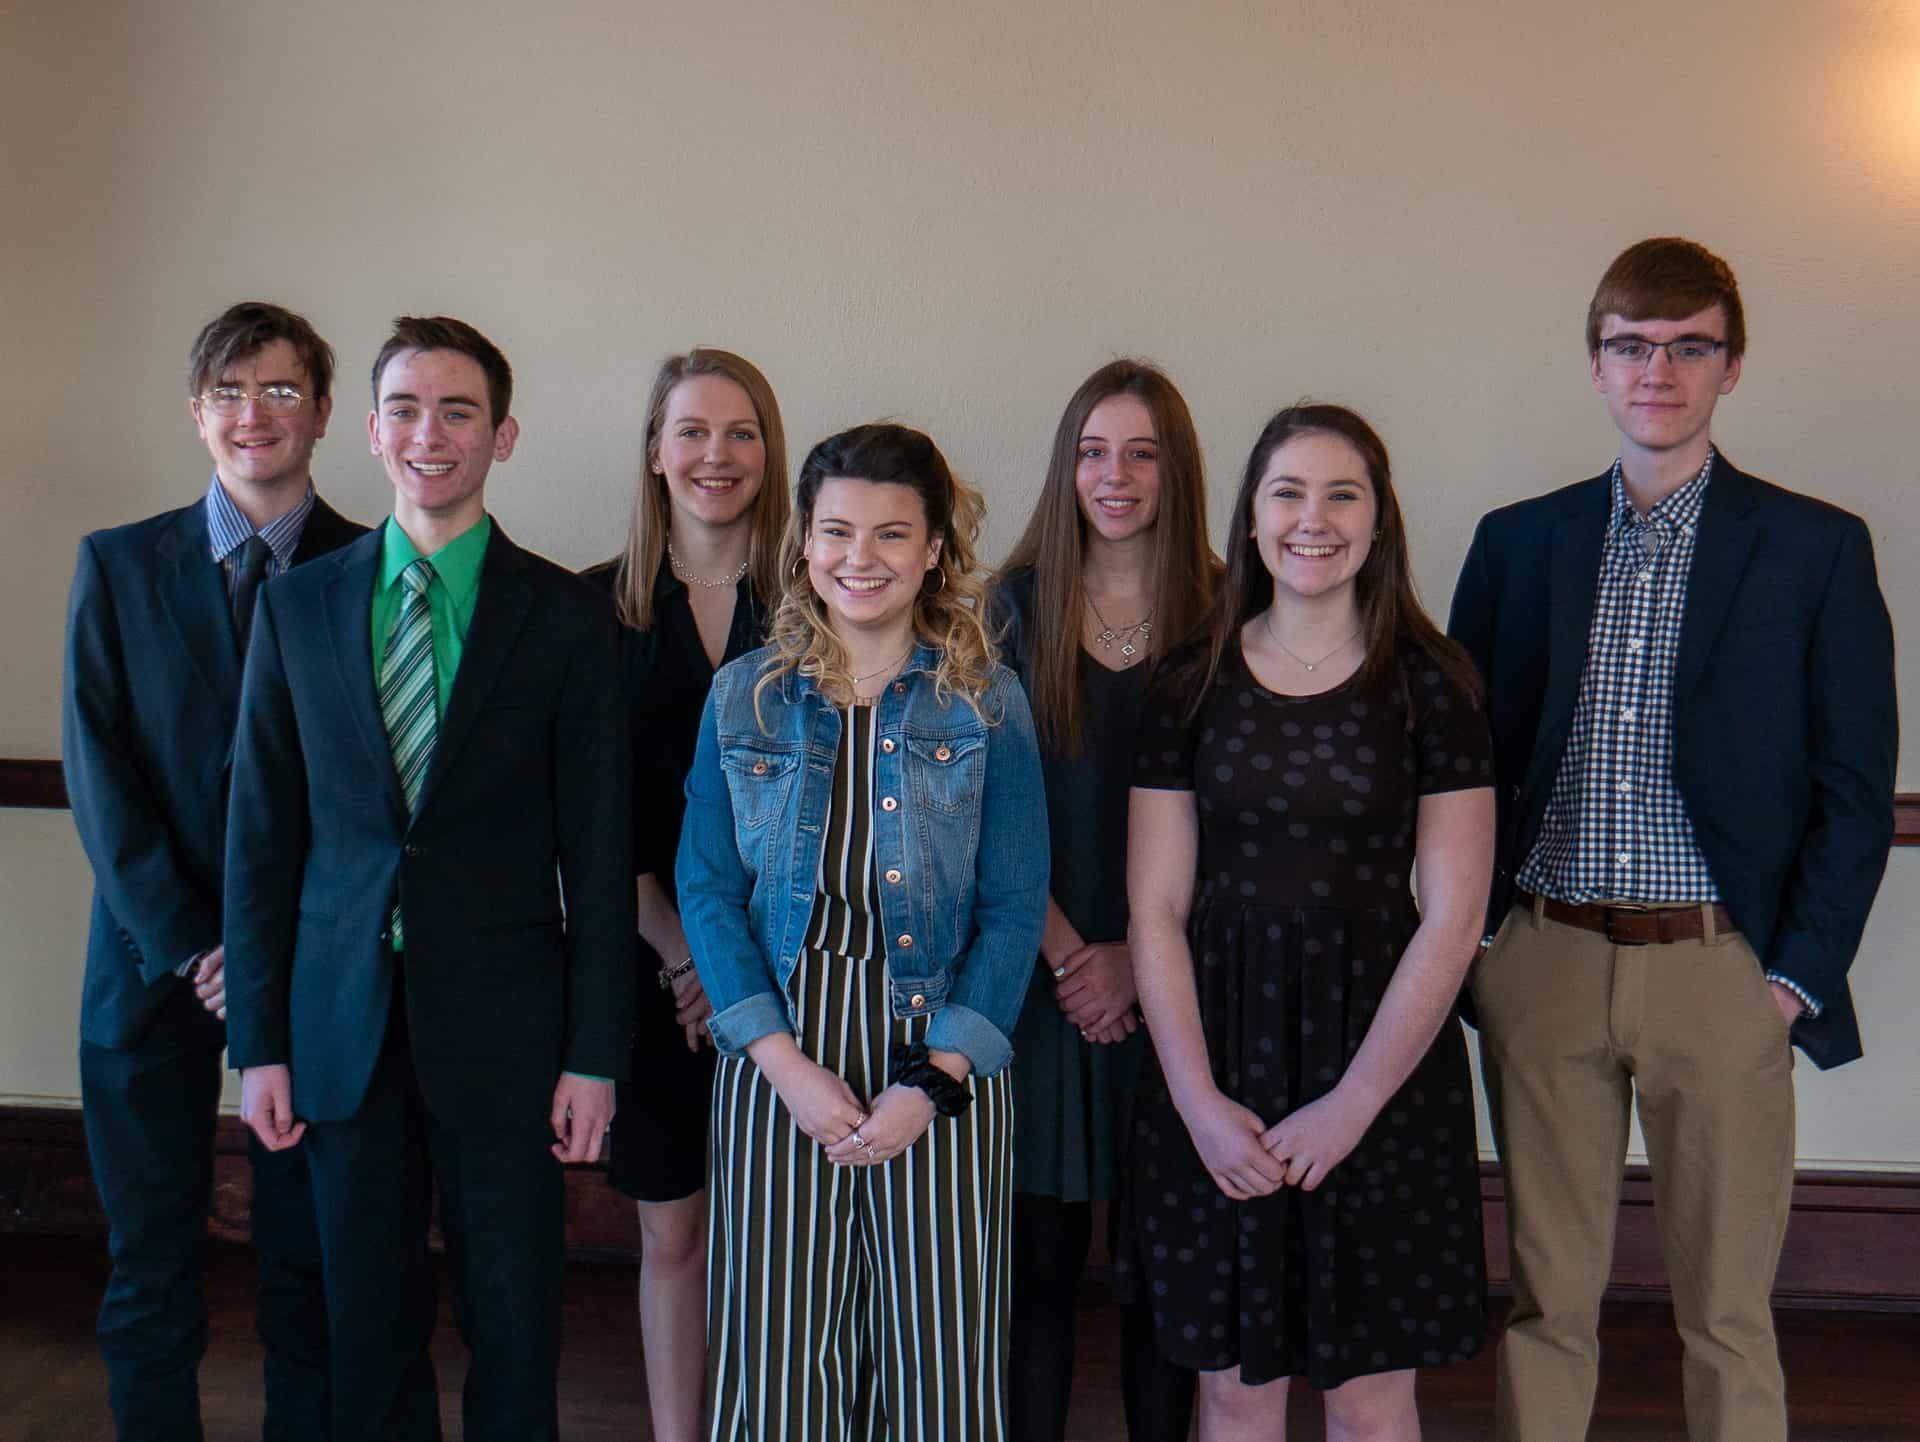 The 2020 INSPIRE Scholarship winners